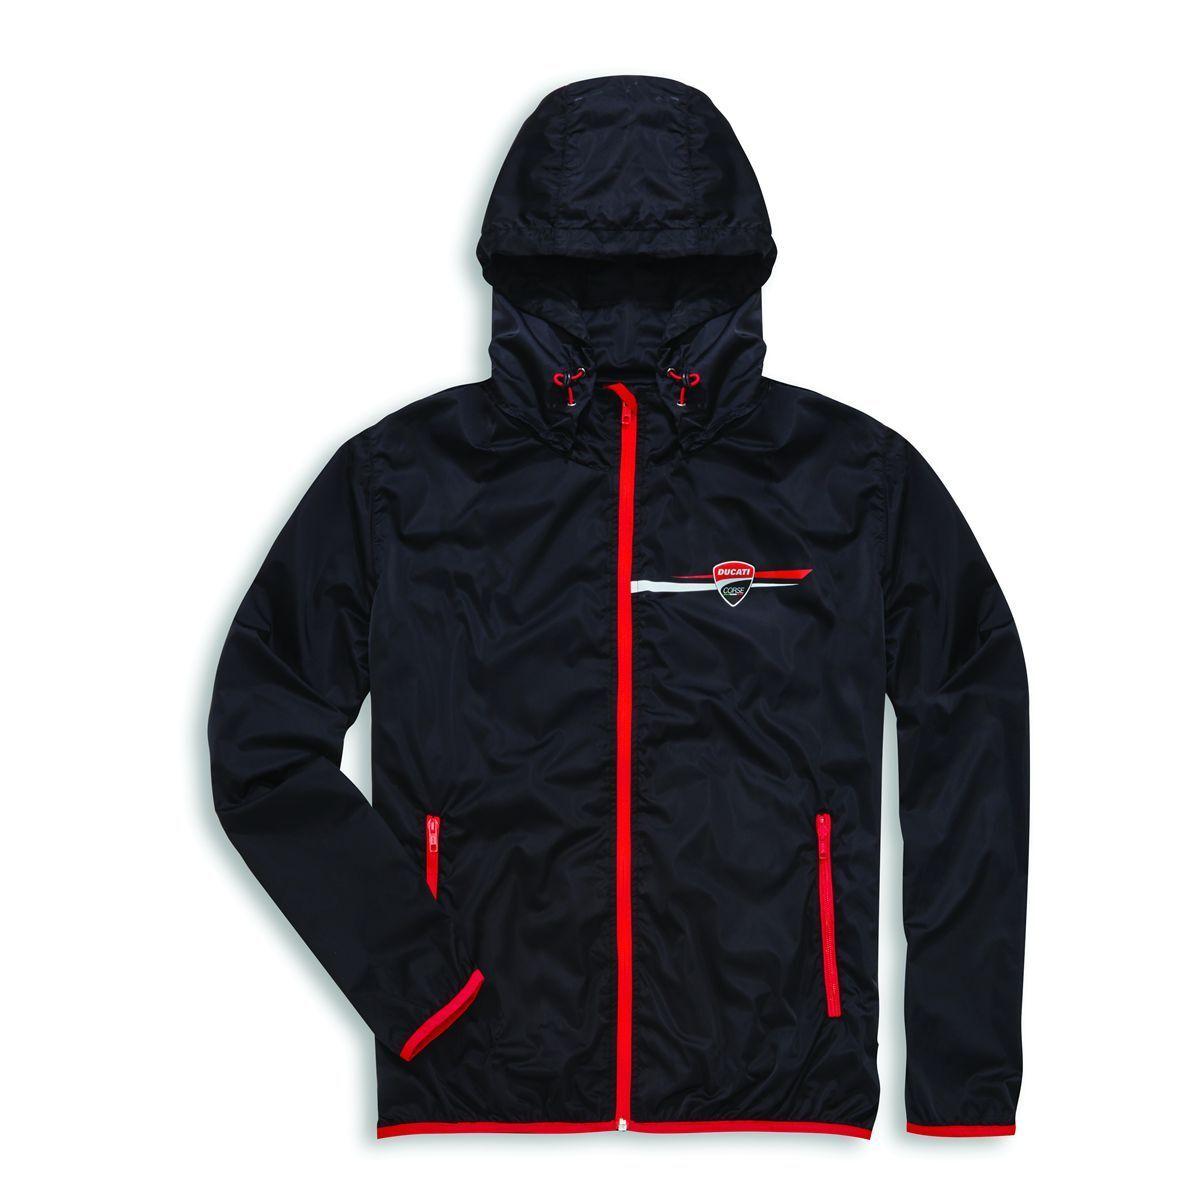 Ducati Corse Stripe Regenjacke Motorrad Rain Jacket Freizeit wasserdicht schwarz